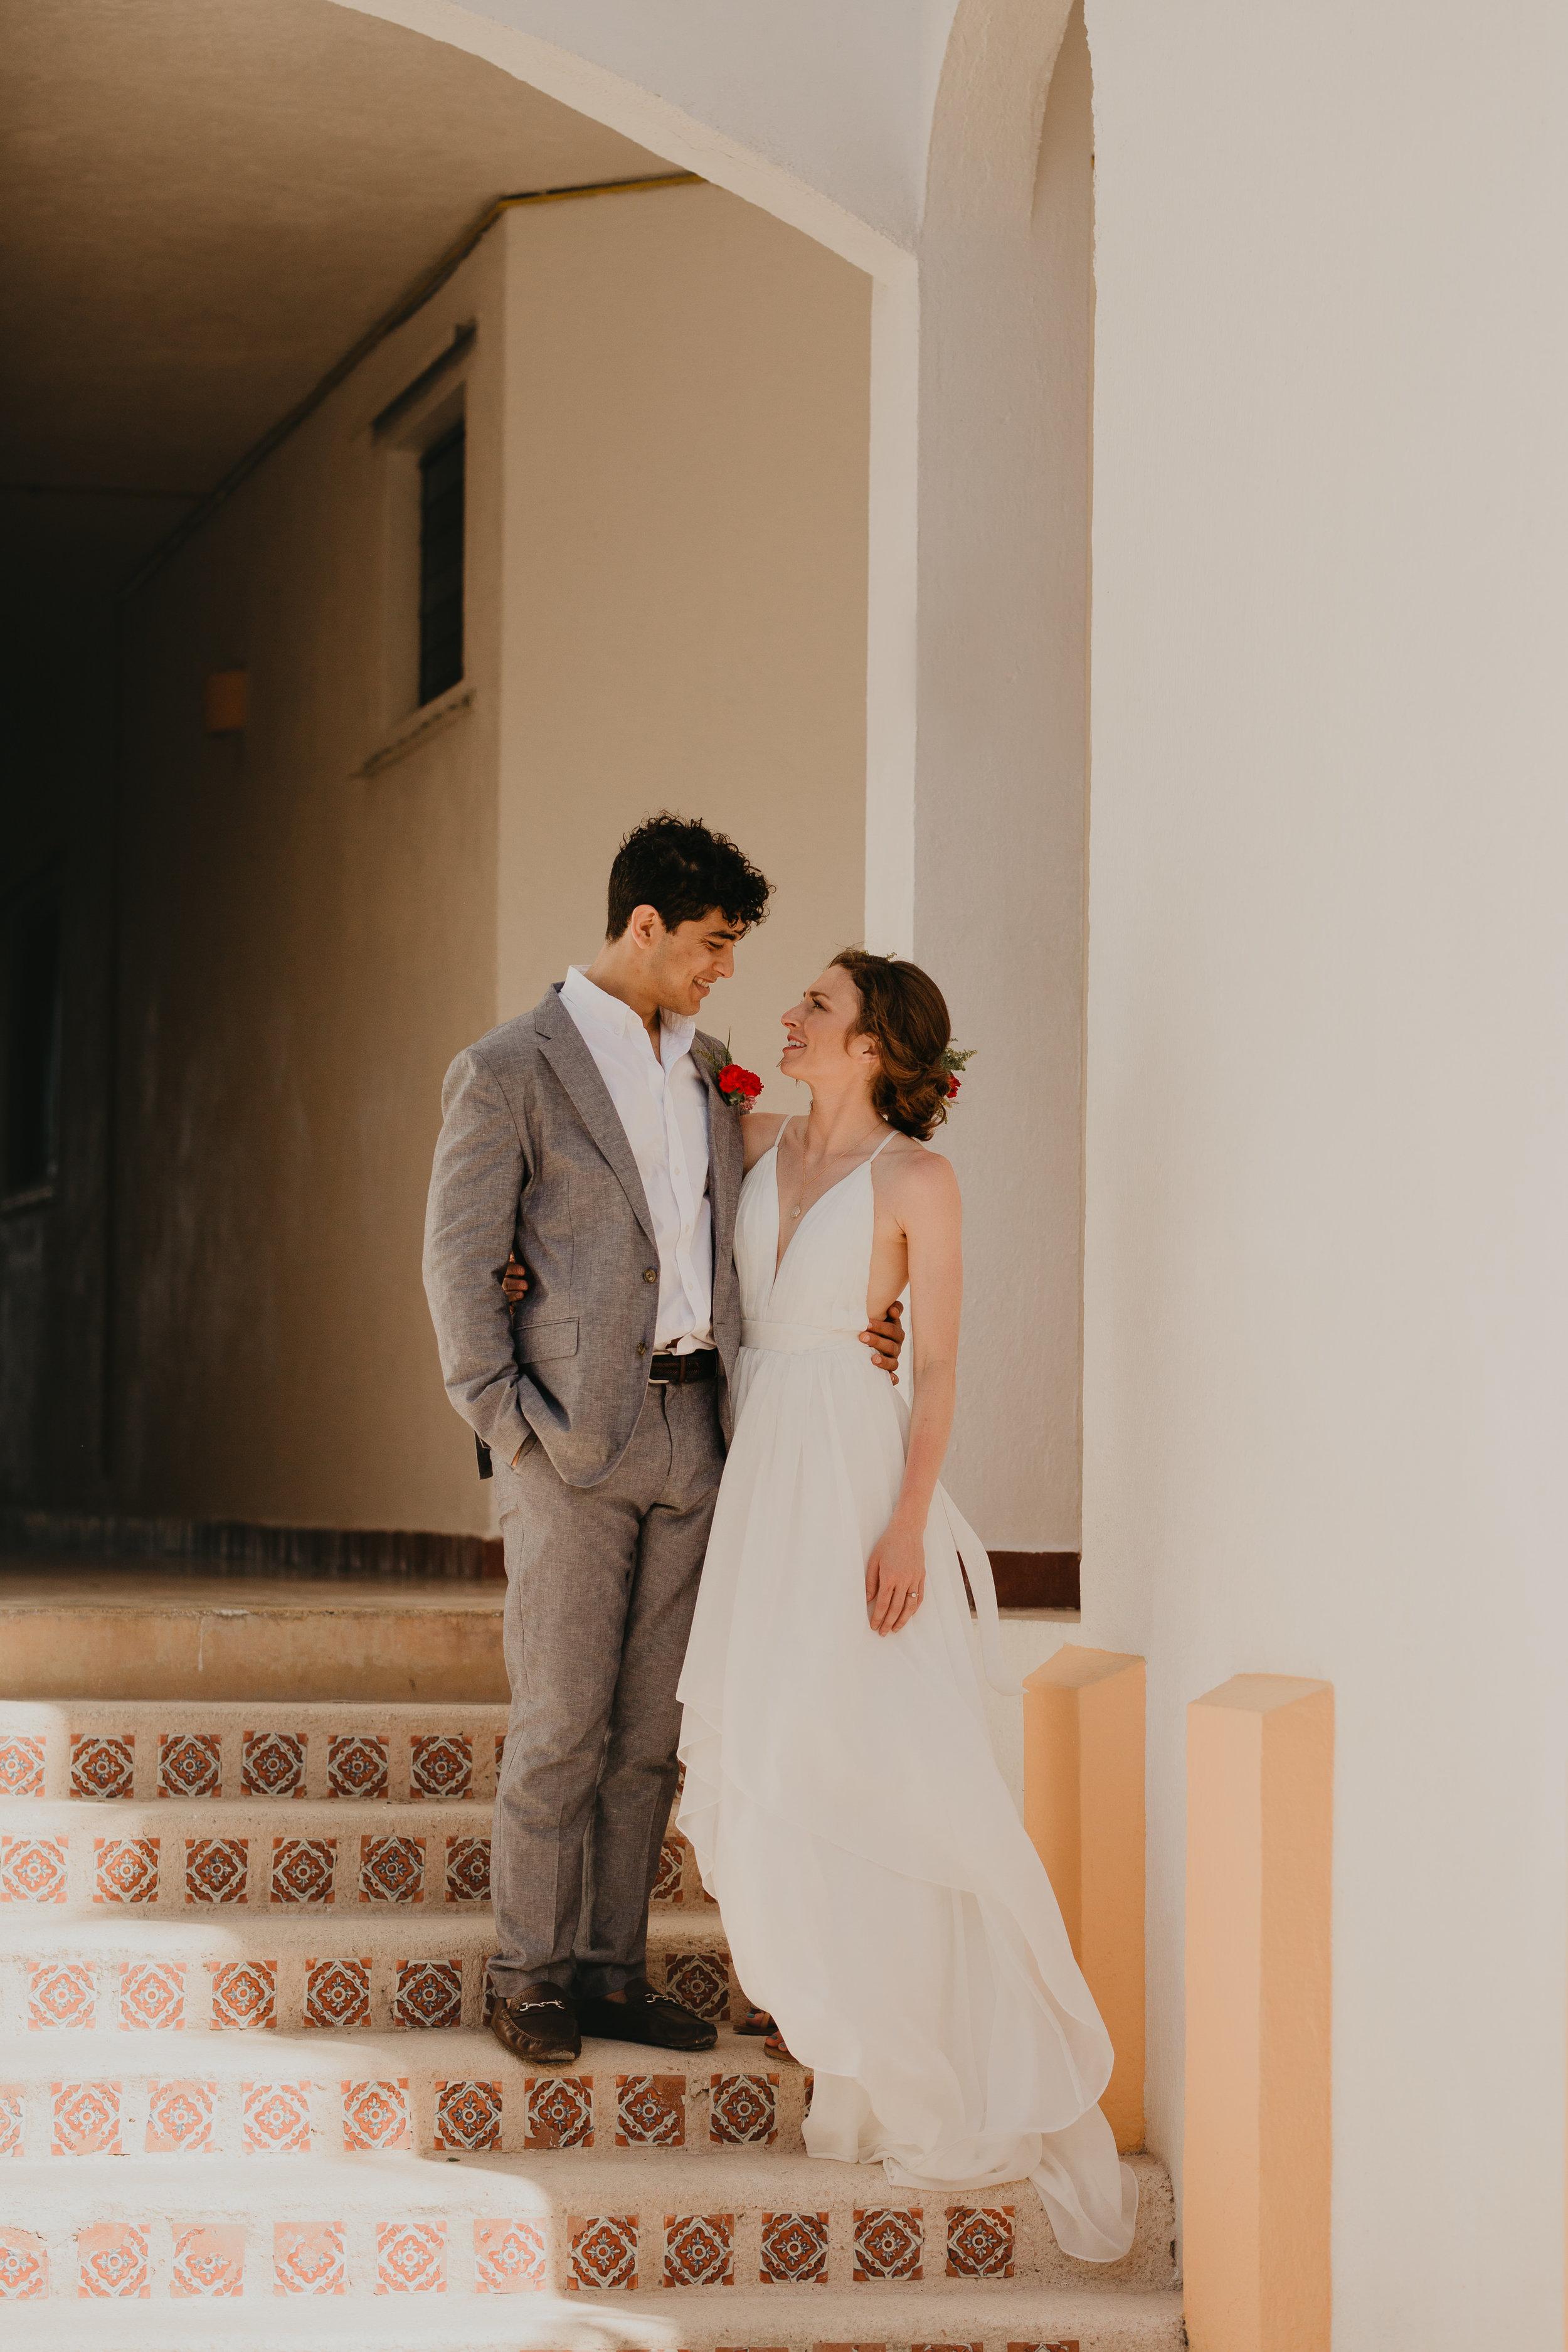 Nicole-Daacke-Photography-beachfront-akumal-destionation-wedding-tulum-mexico-elopement-photographer-destination-wedding-inspiration-sunset-champagne-pop-boho-bride-ocean-tropical-bohemian-tulum-wedding-photos-137.jpg